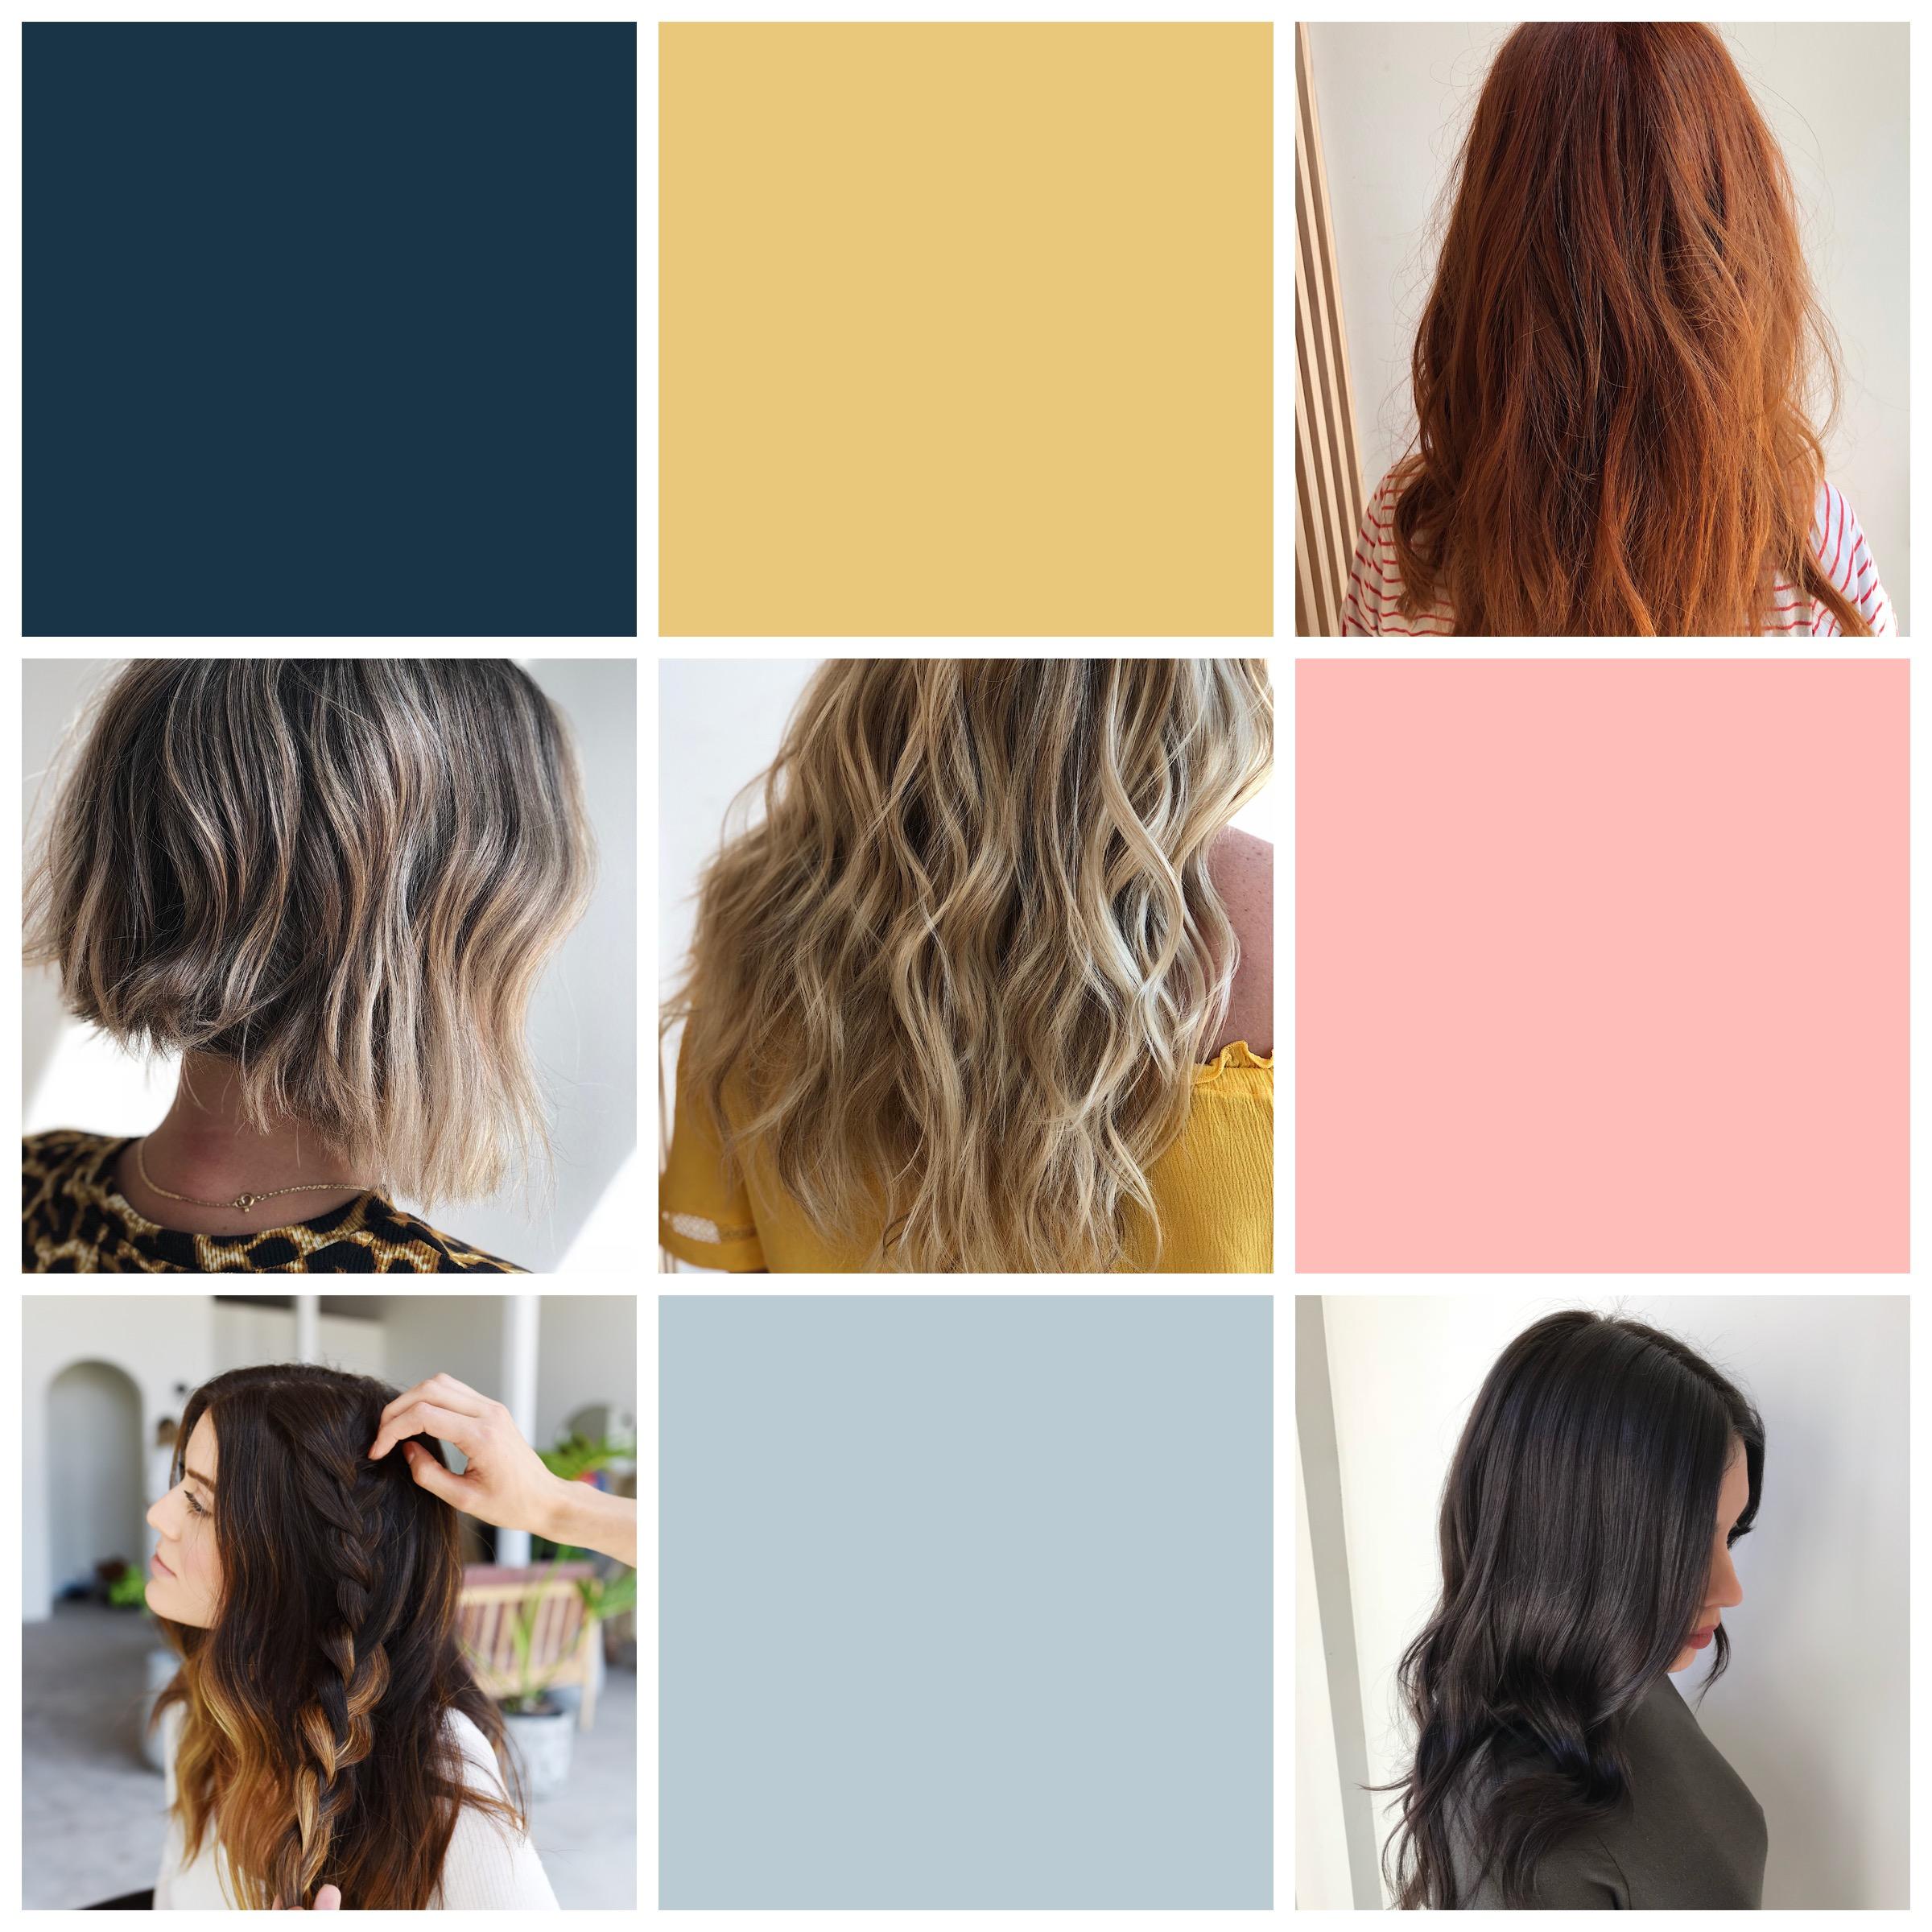 hair stylist instagram template